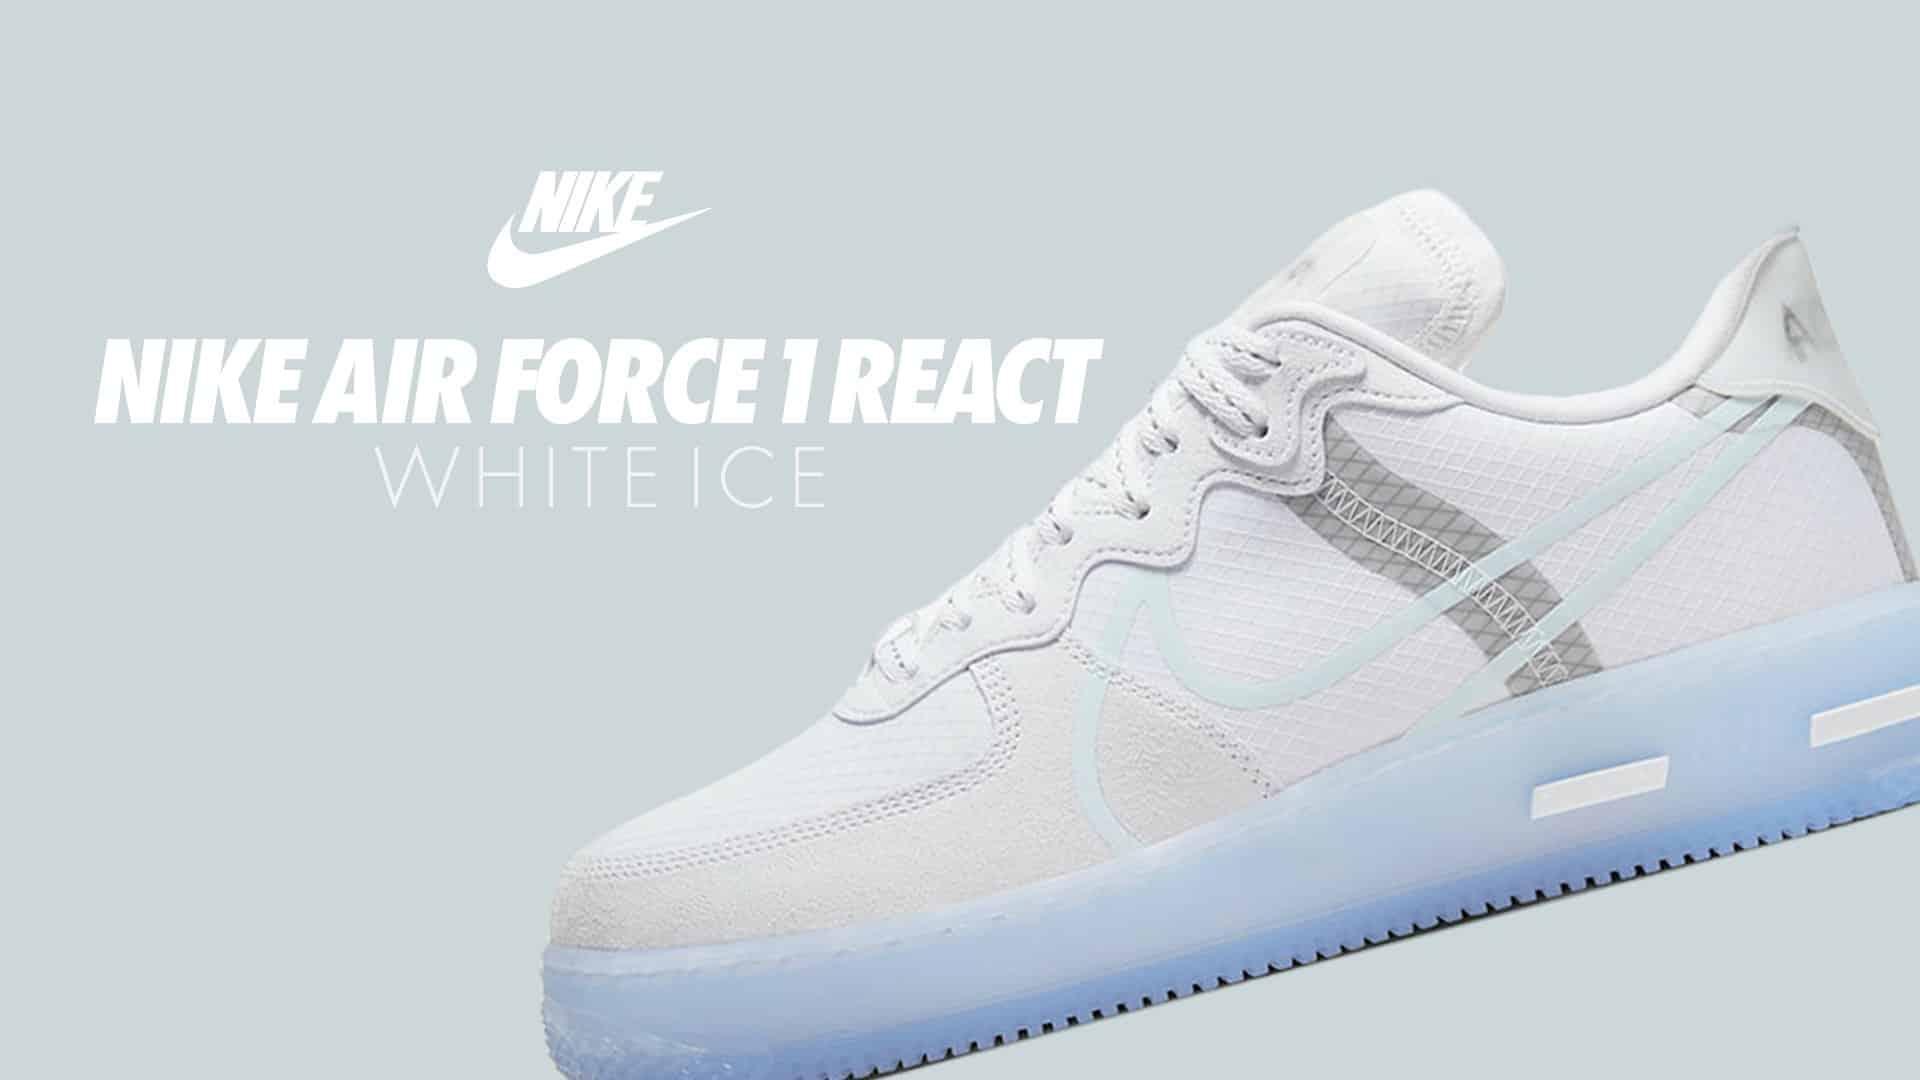 Nike Air Force 1 React White Ice